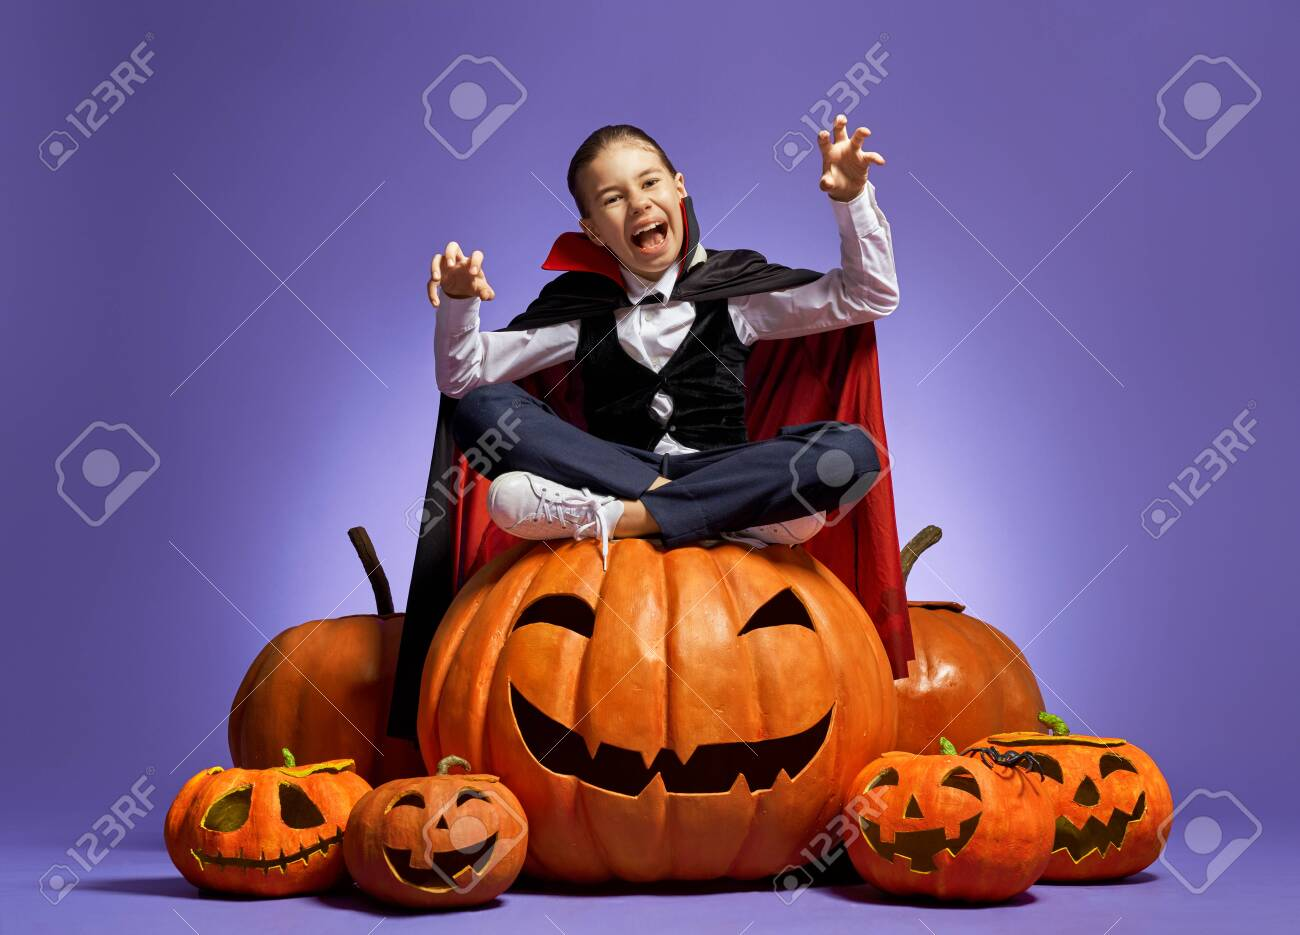 Happy Halloween! Cute little Dracula with a pumpkin on purple - 129603333